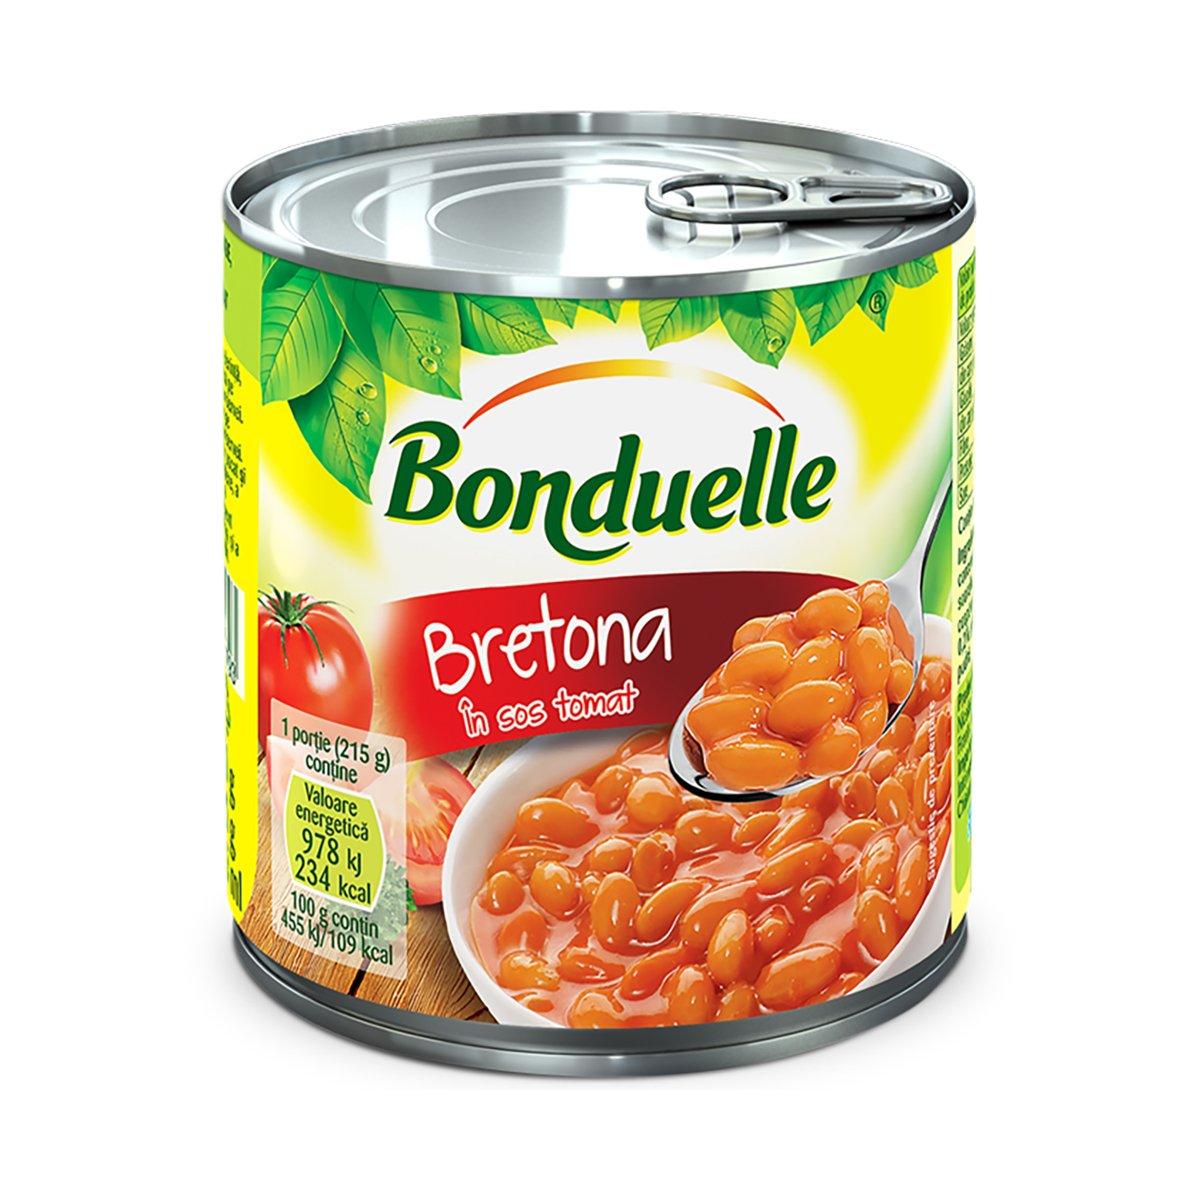 Fasole alba boabe in sos tomat, Bonduelle Bretona, cutie, 425 ml imagine